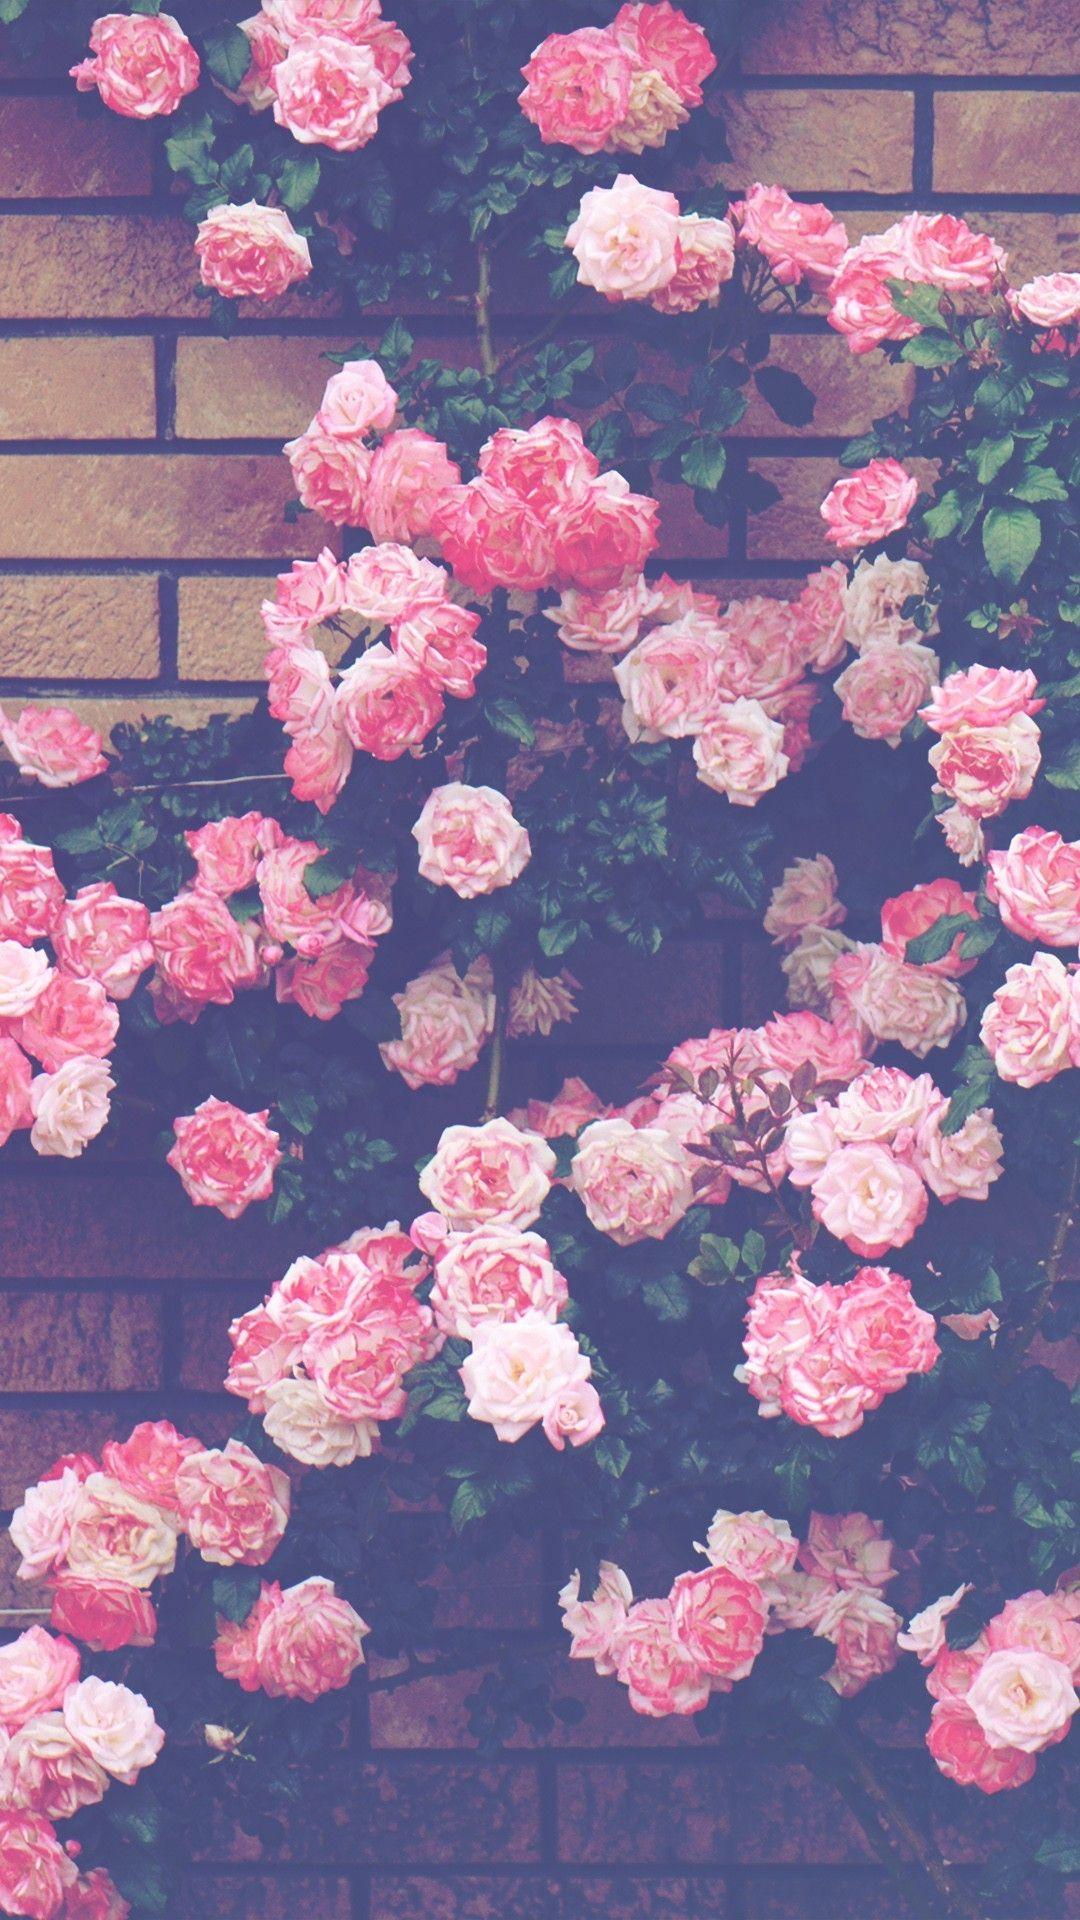 1080x1920 Hintergrundbilder Telefon HintergrA 1 4 Nde Tapete HA Bsche Tumblr Wallpaper Pink Flower